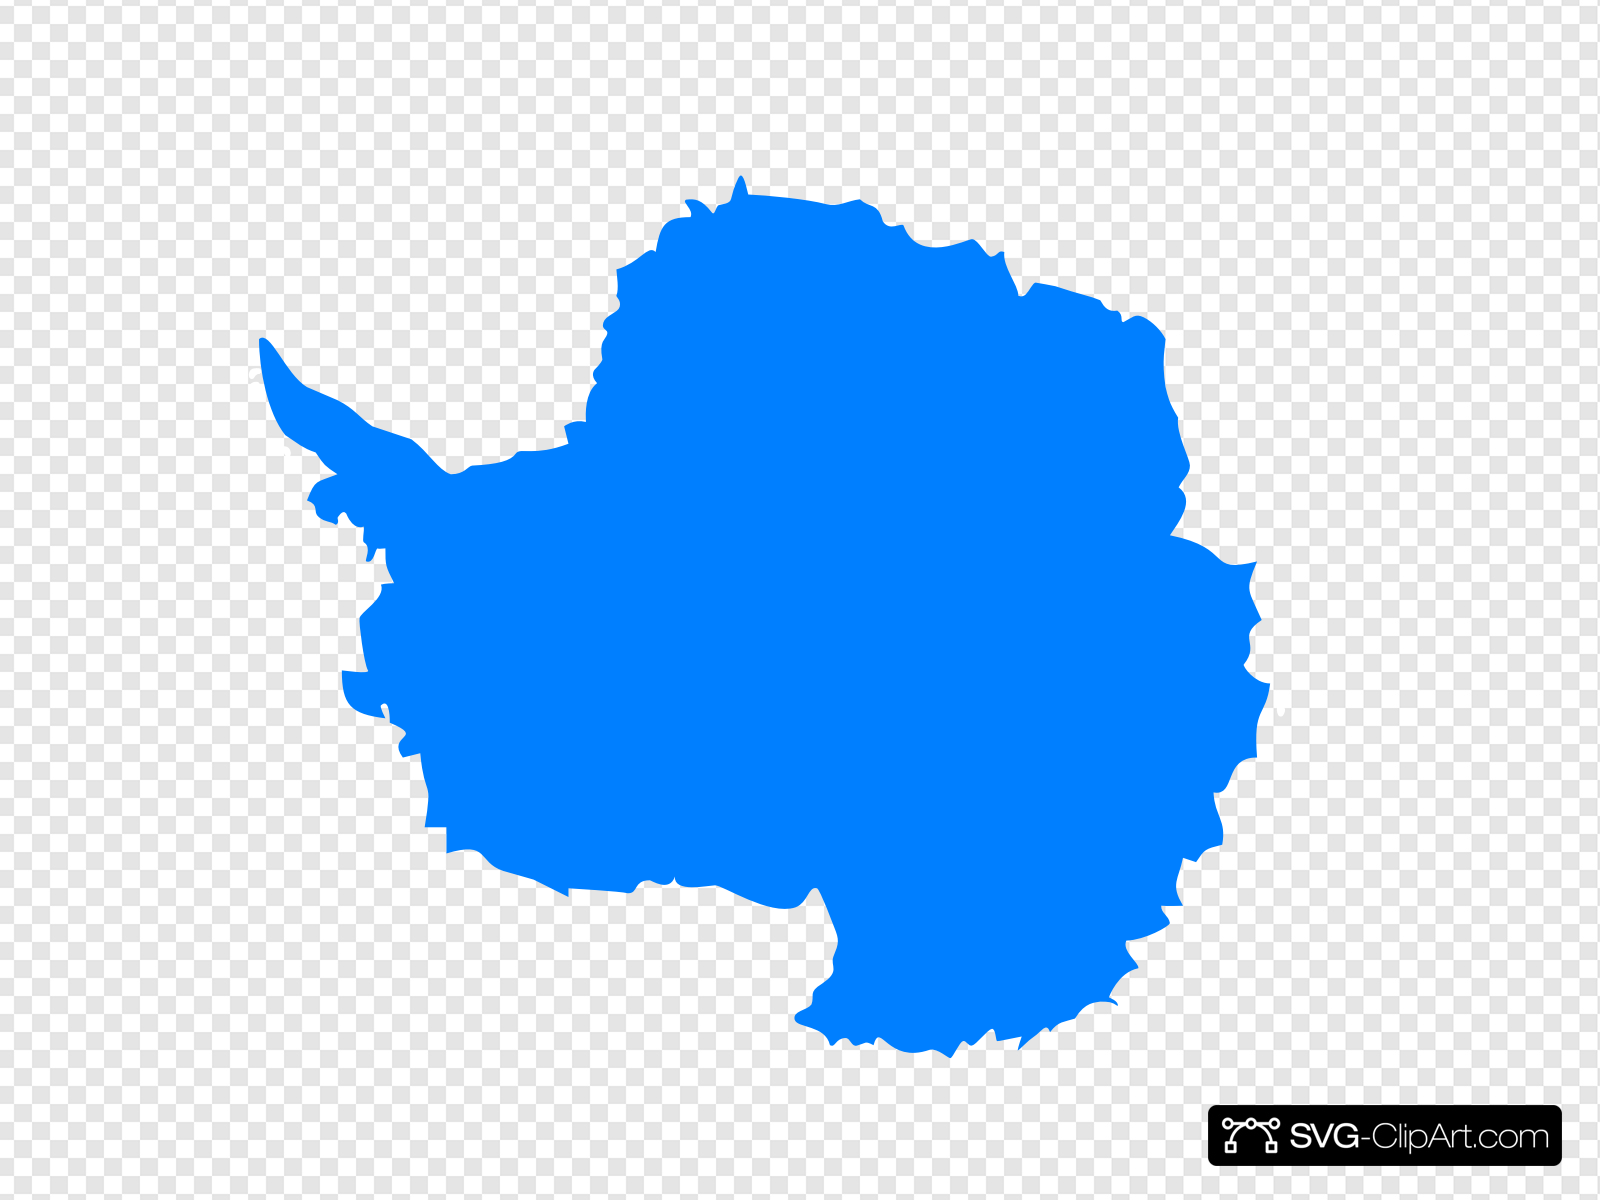 Antarctica Clip art, Icon and SVG.